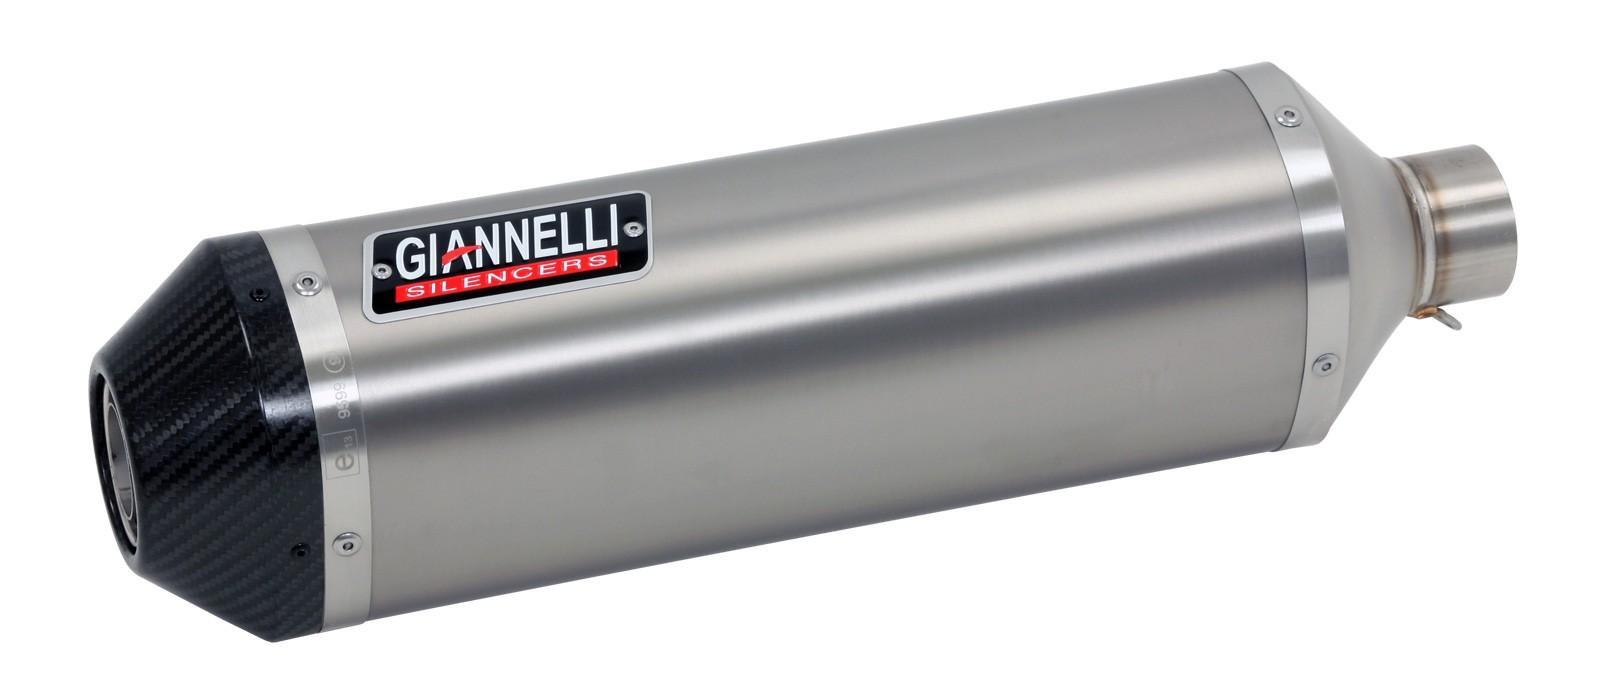 ESCAPES GIANNELLI YAMAHA - Sistema completo IPERSPORT Silenciador aluminio versión Black Line Yamaha YZF-R 125 Giannell